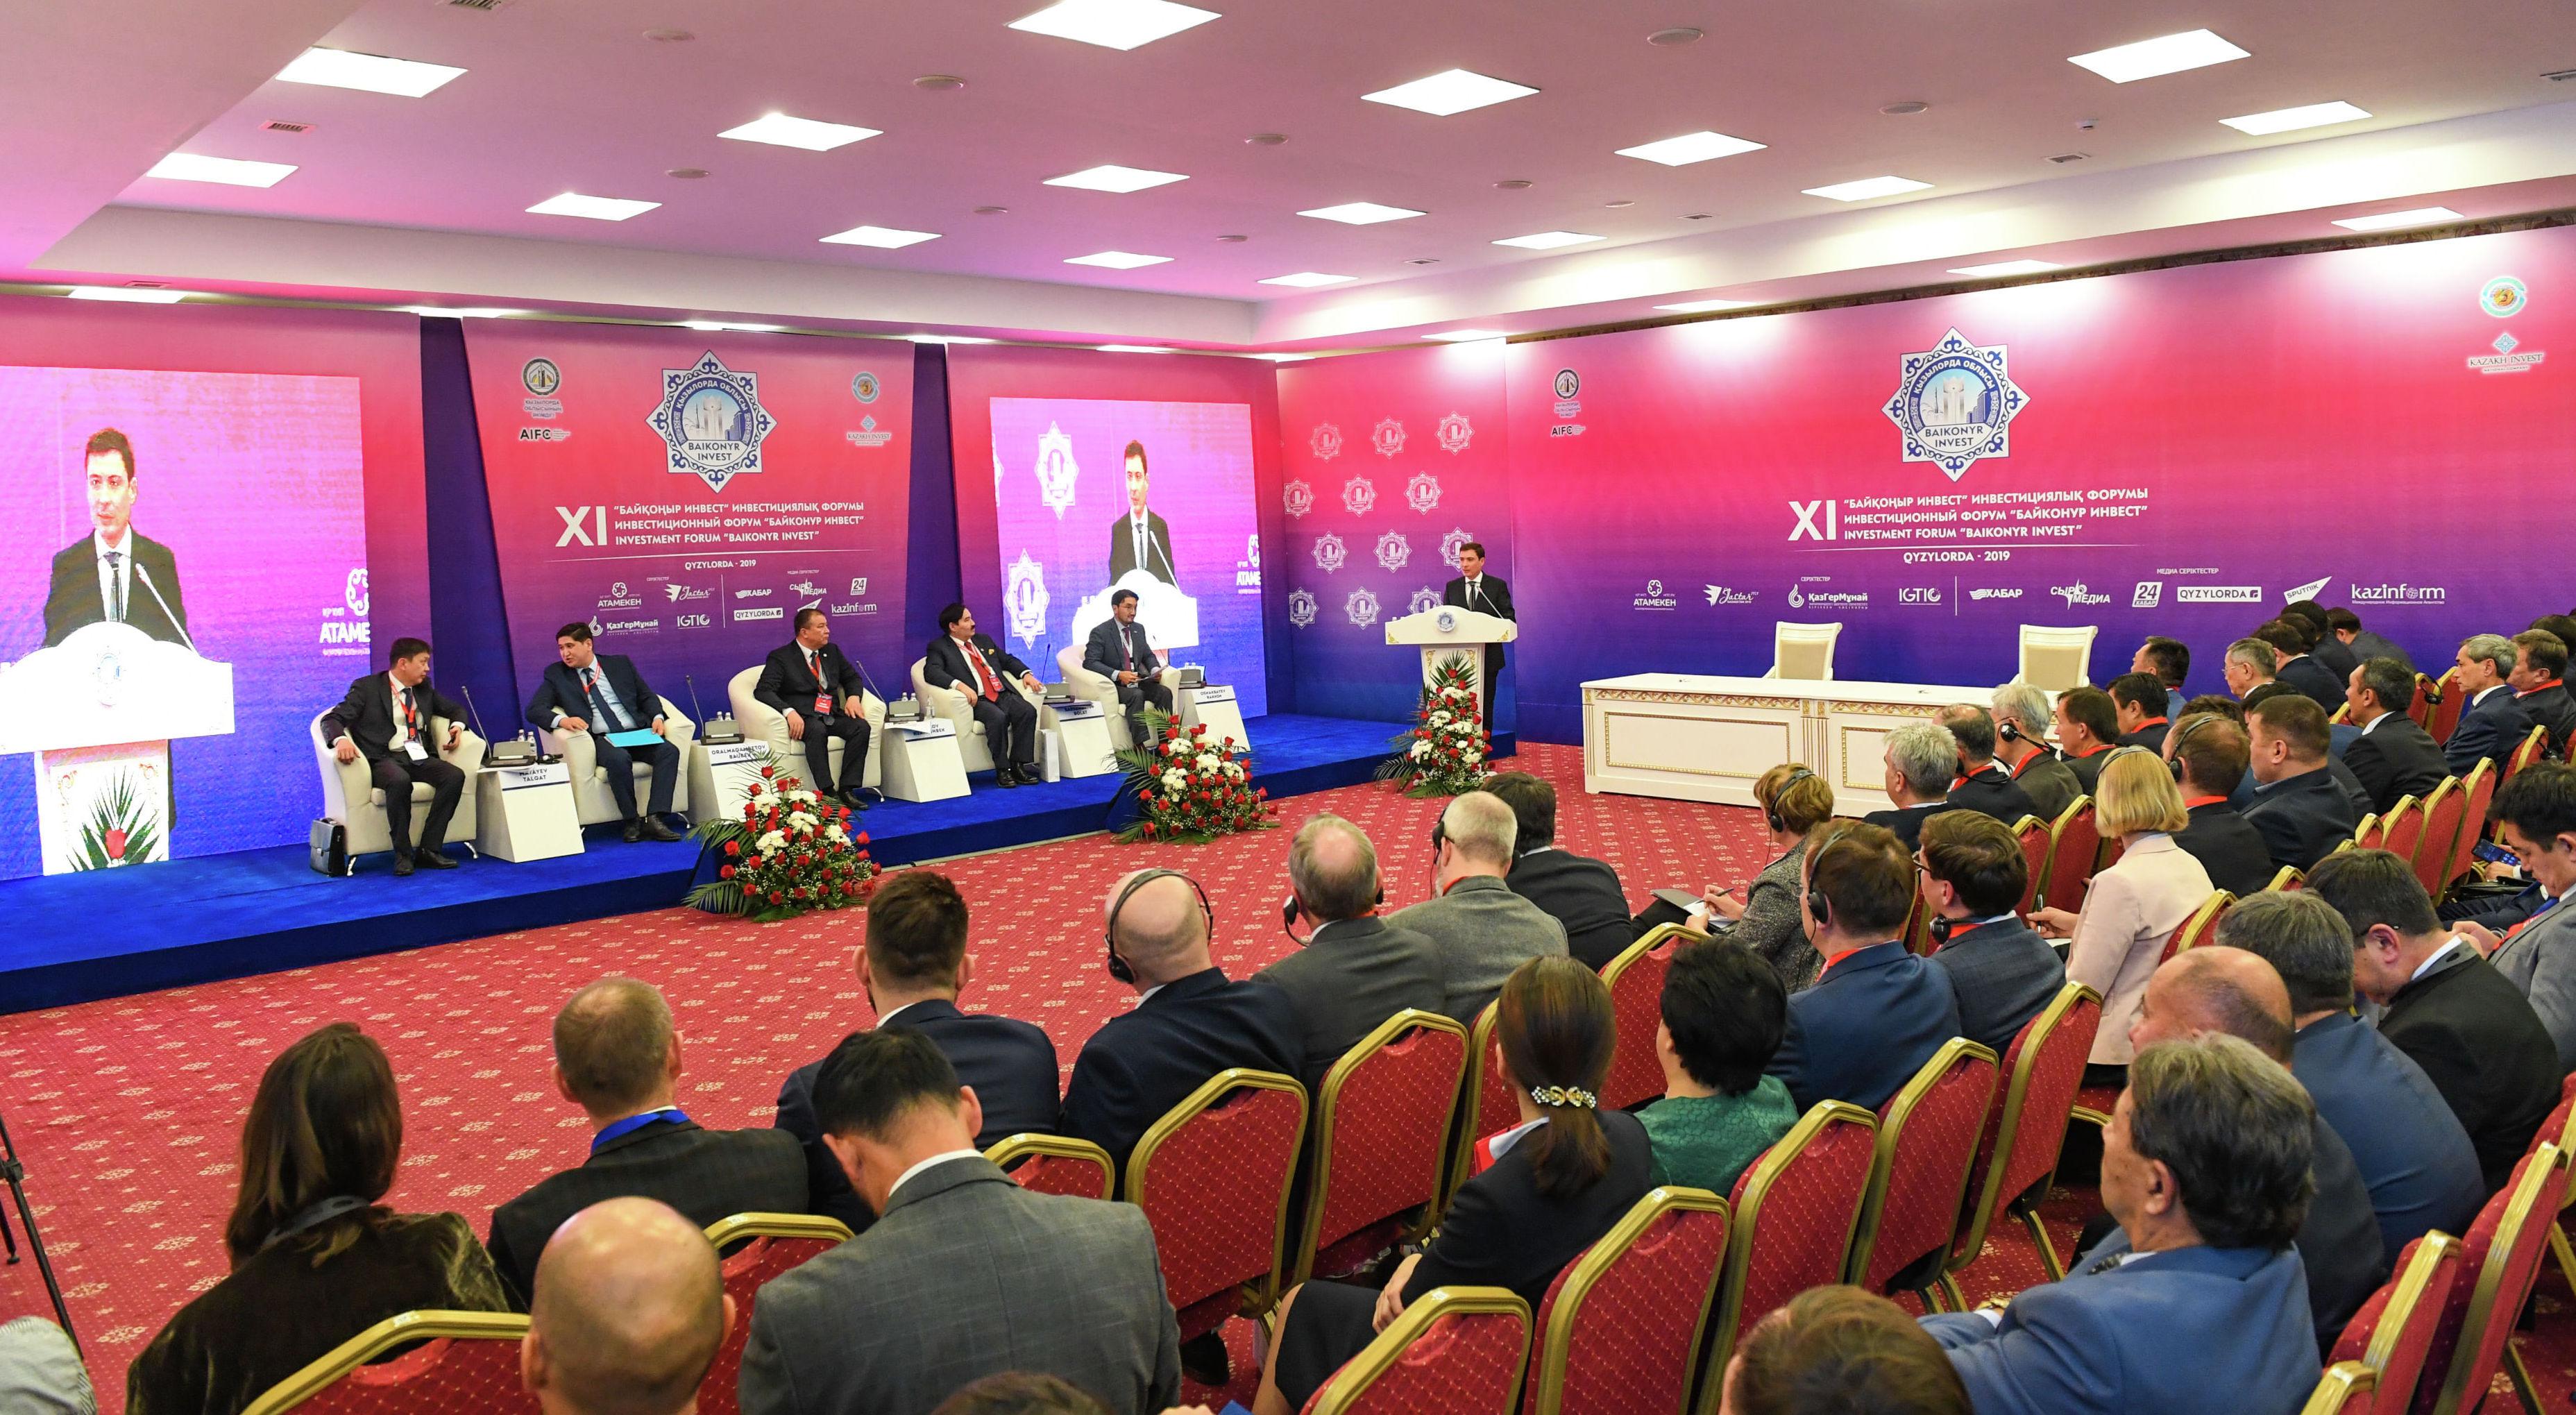 ХI Инвестиционный форум Baikonyr Invest